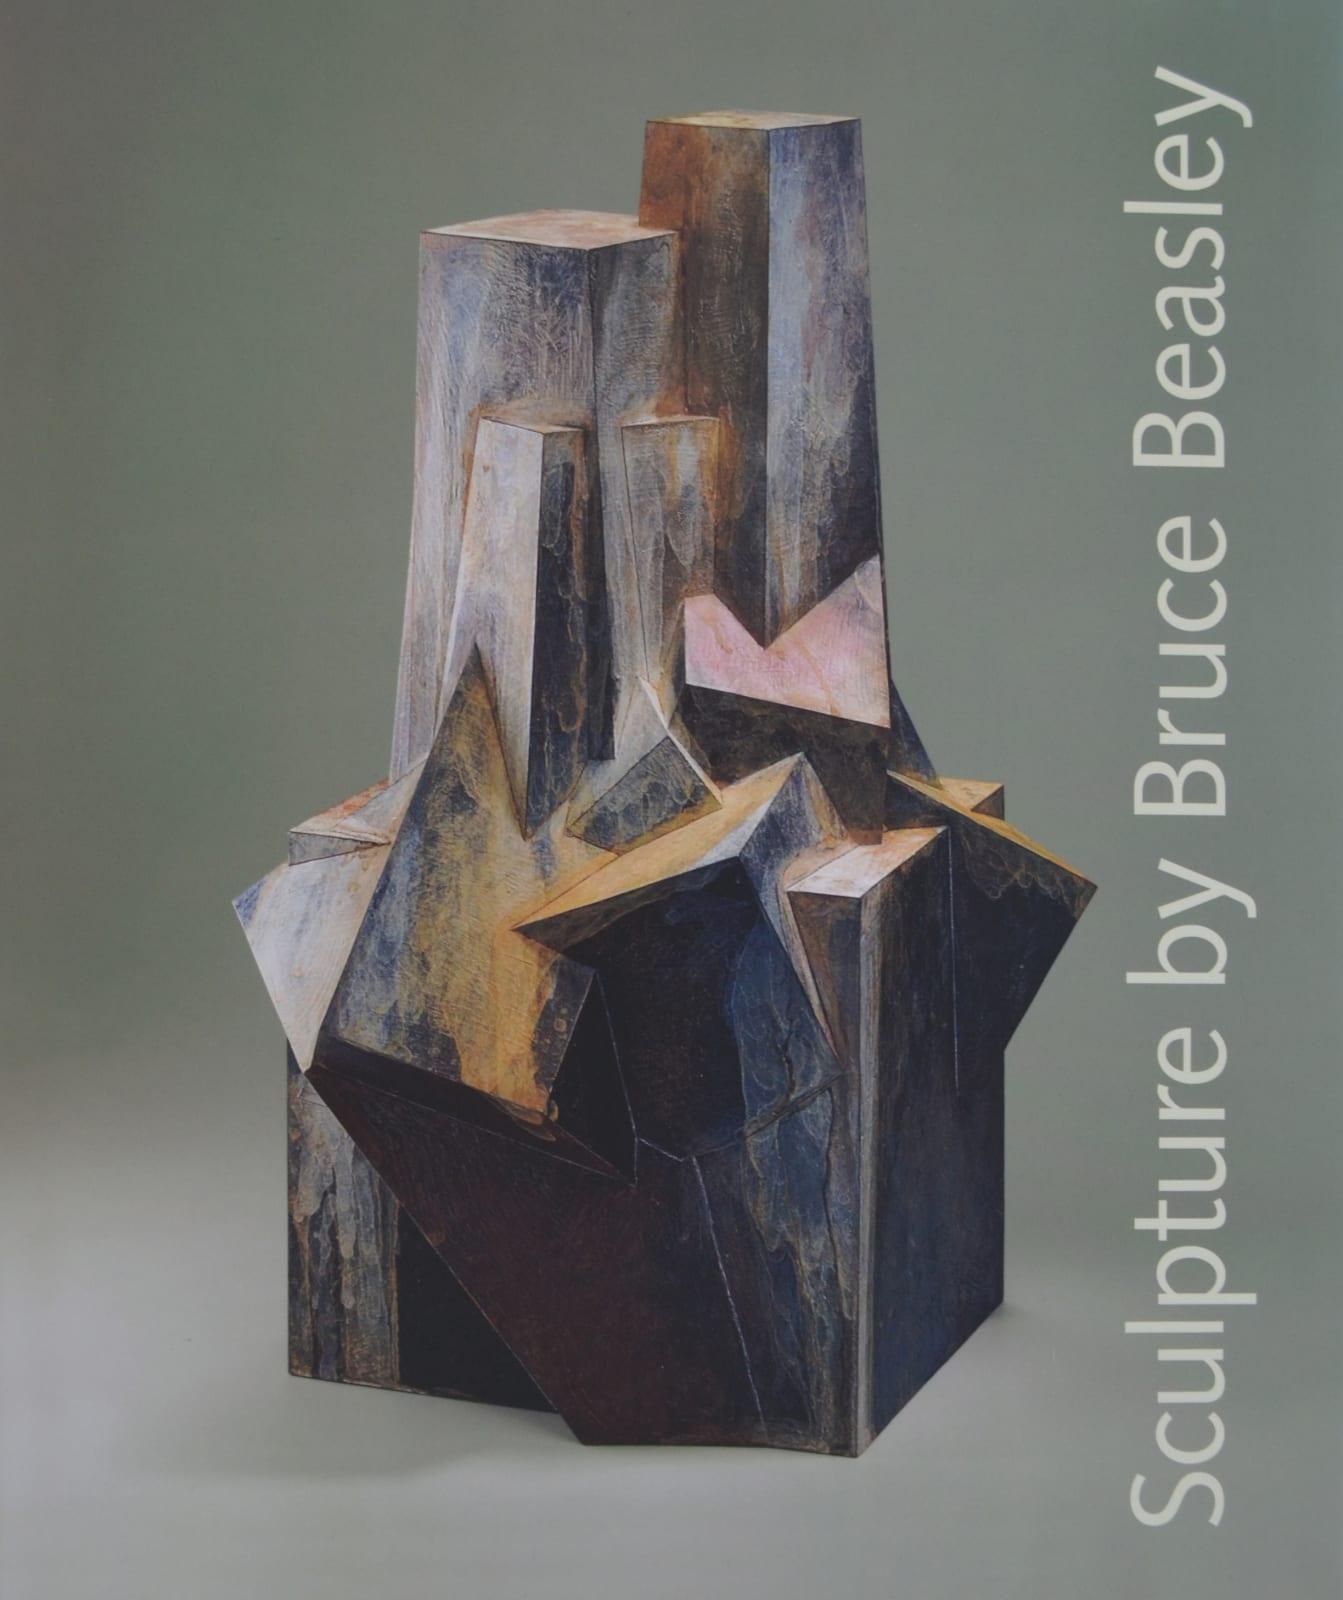 Sculpture by Bruce Beasley